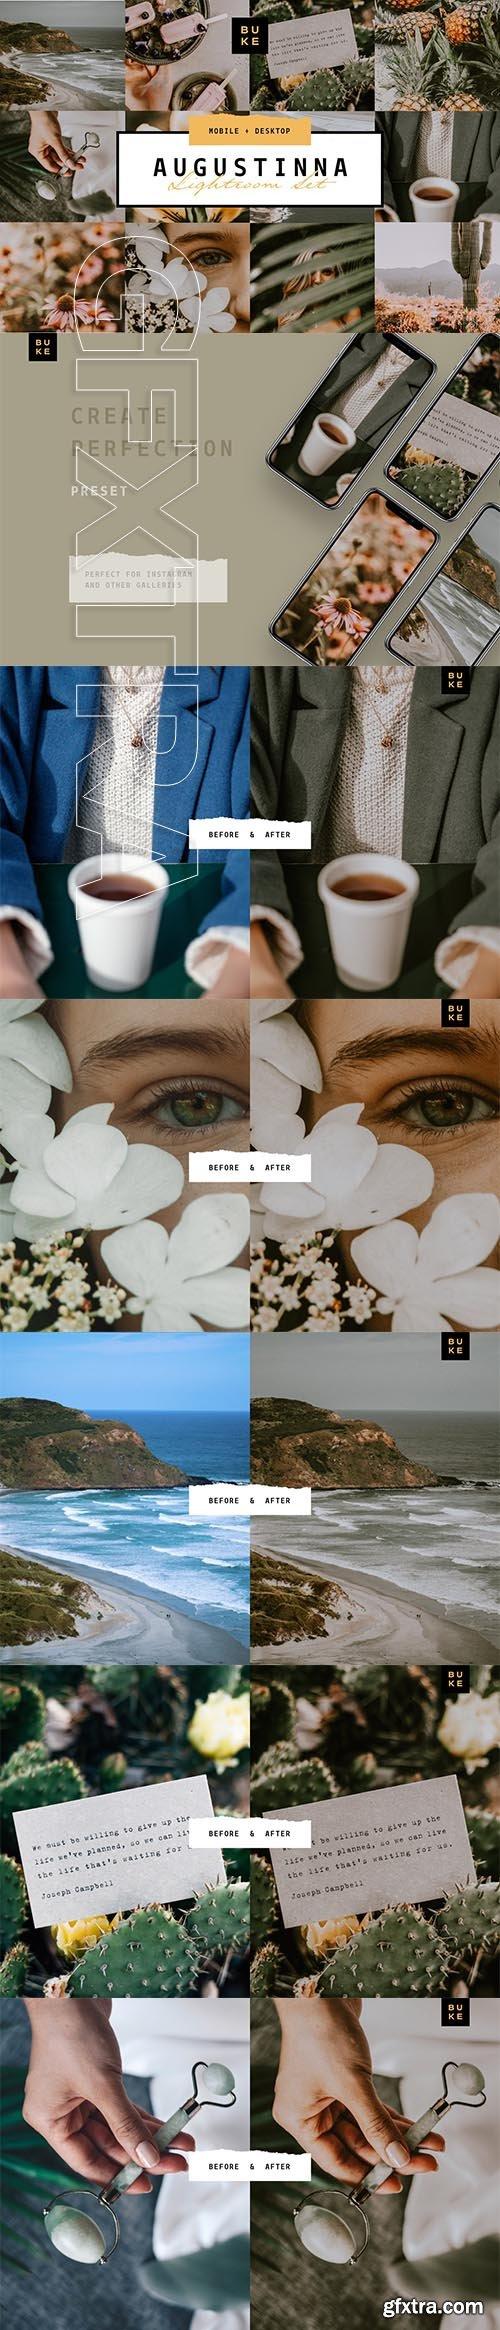 CreativeMarket - Augustina Lightroom Preset 4008293